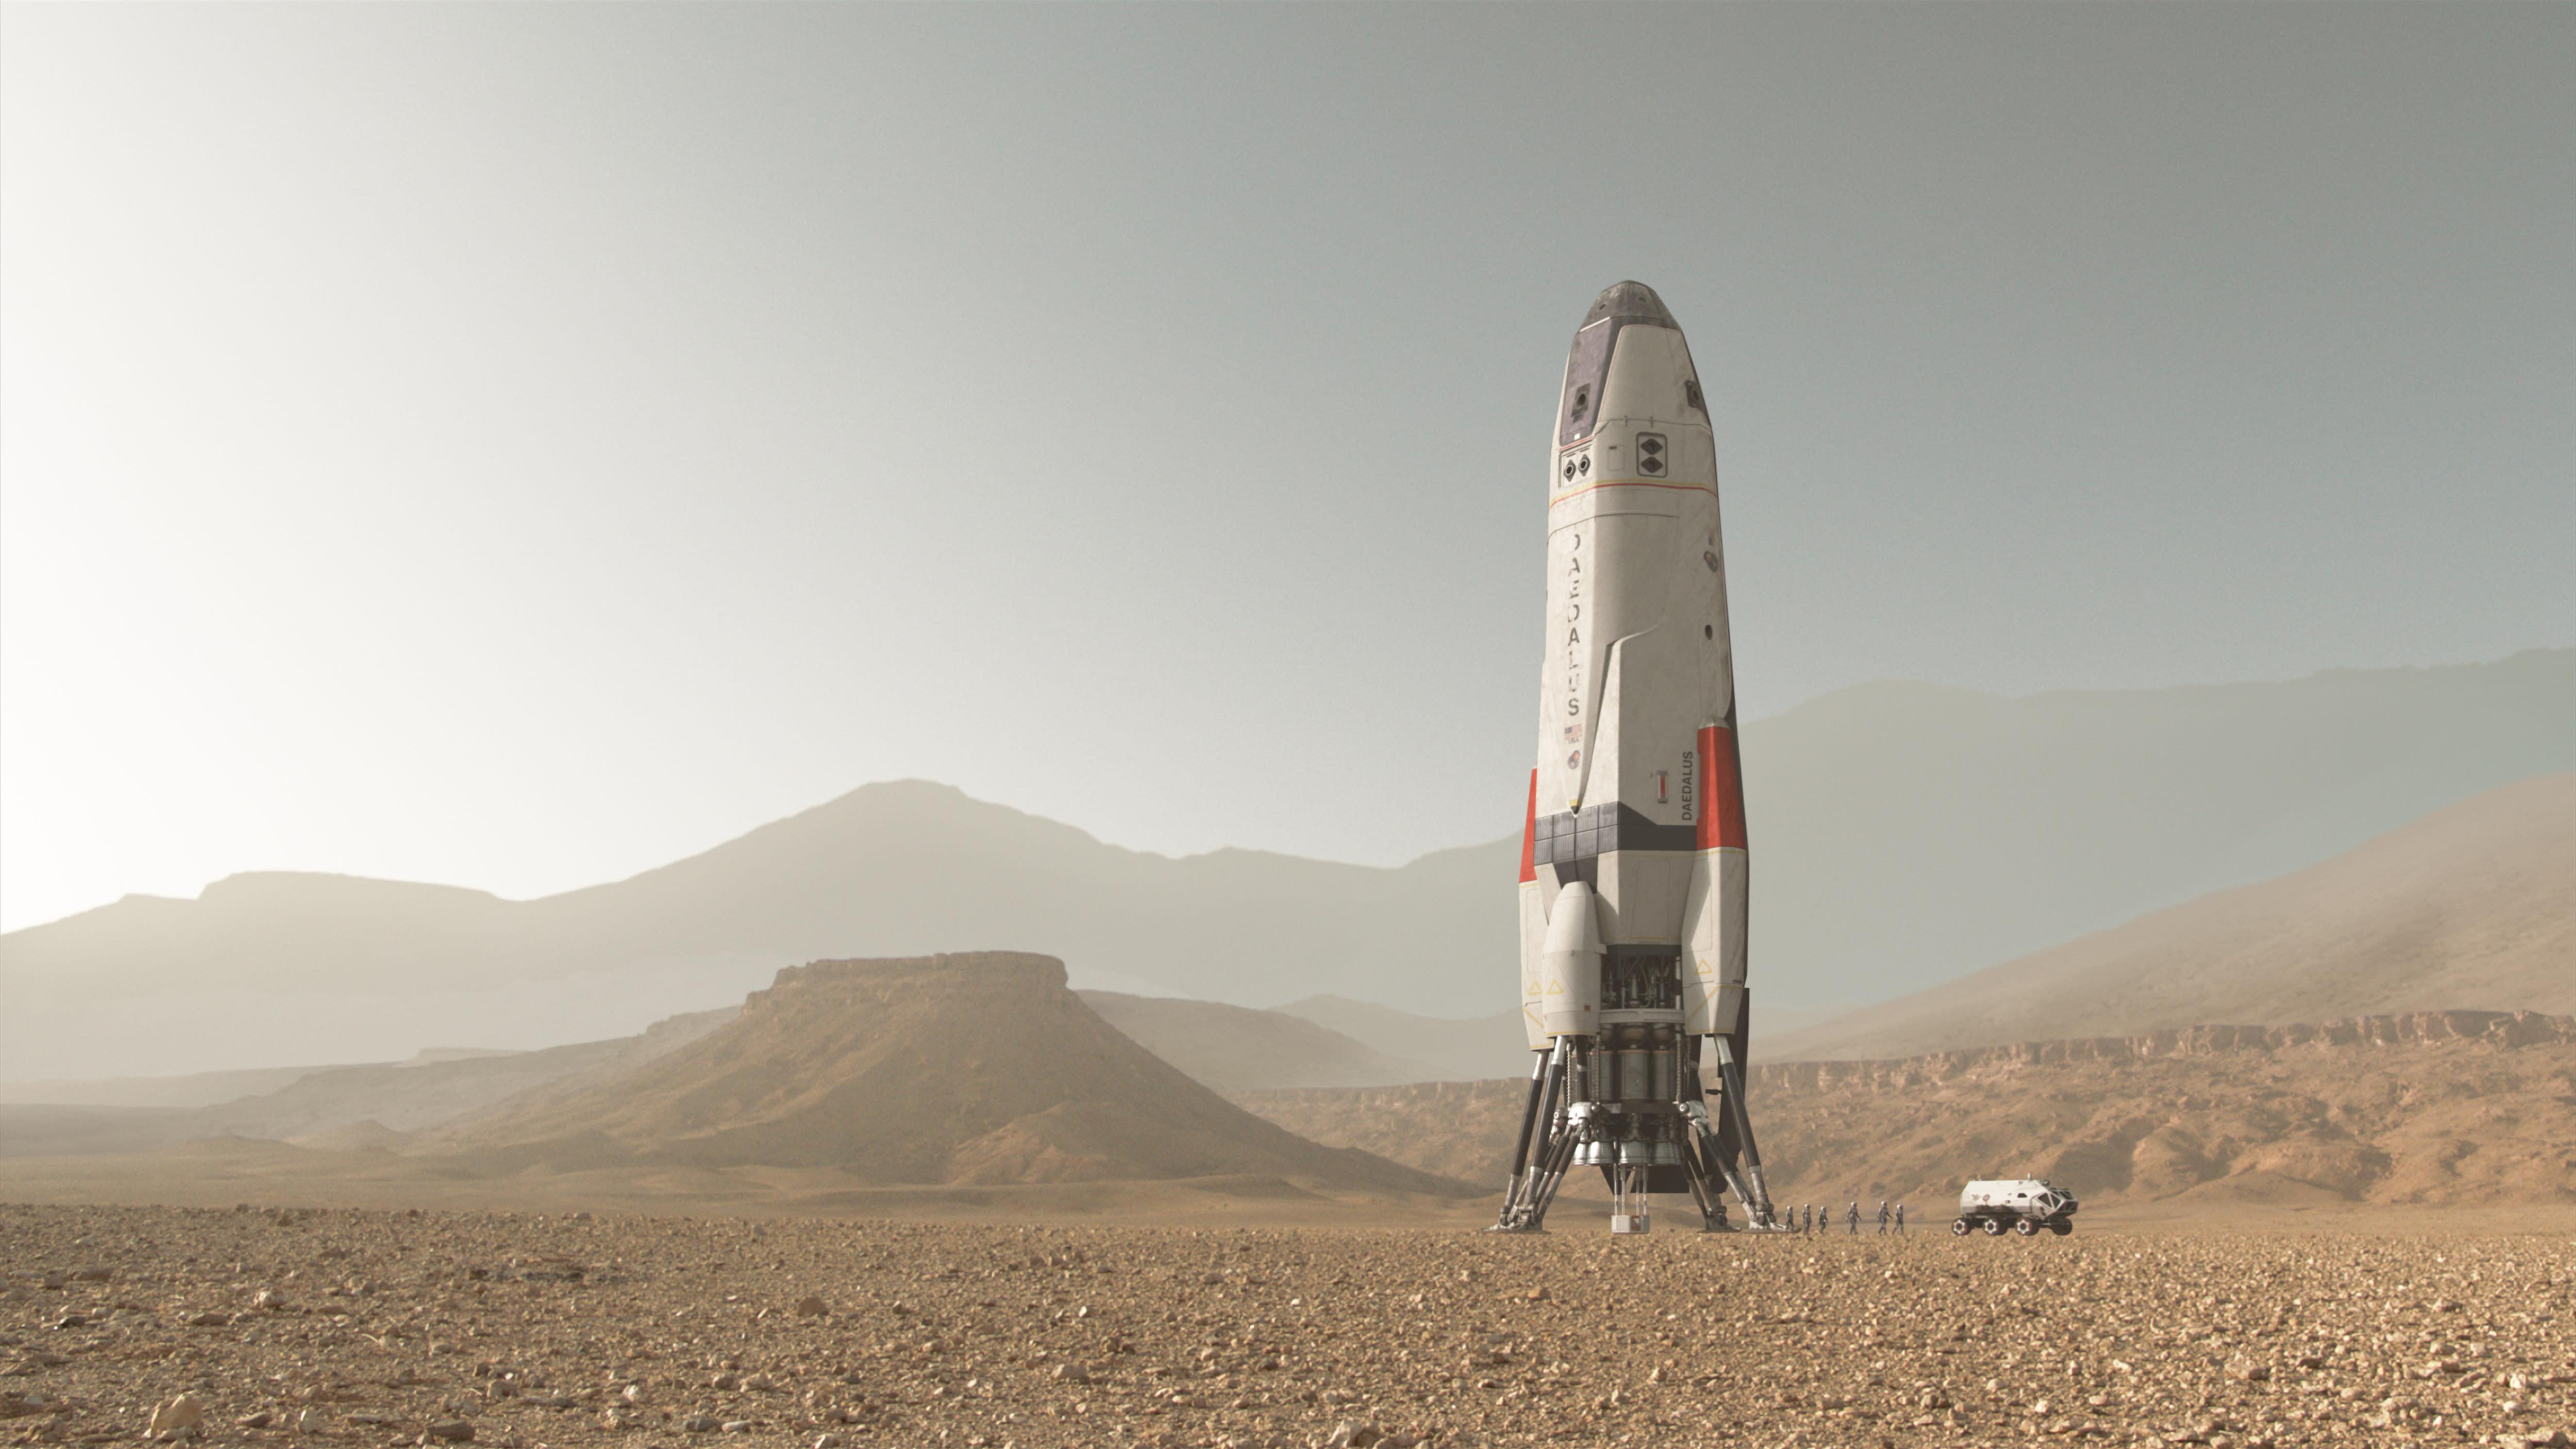 mars mission nasa - HD2064×1161